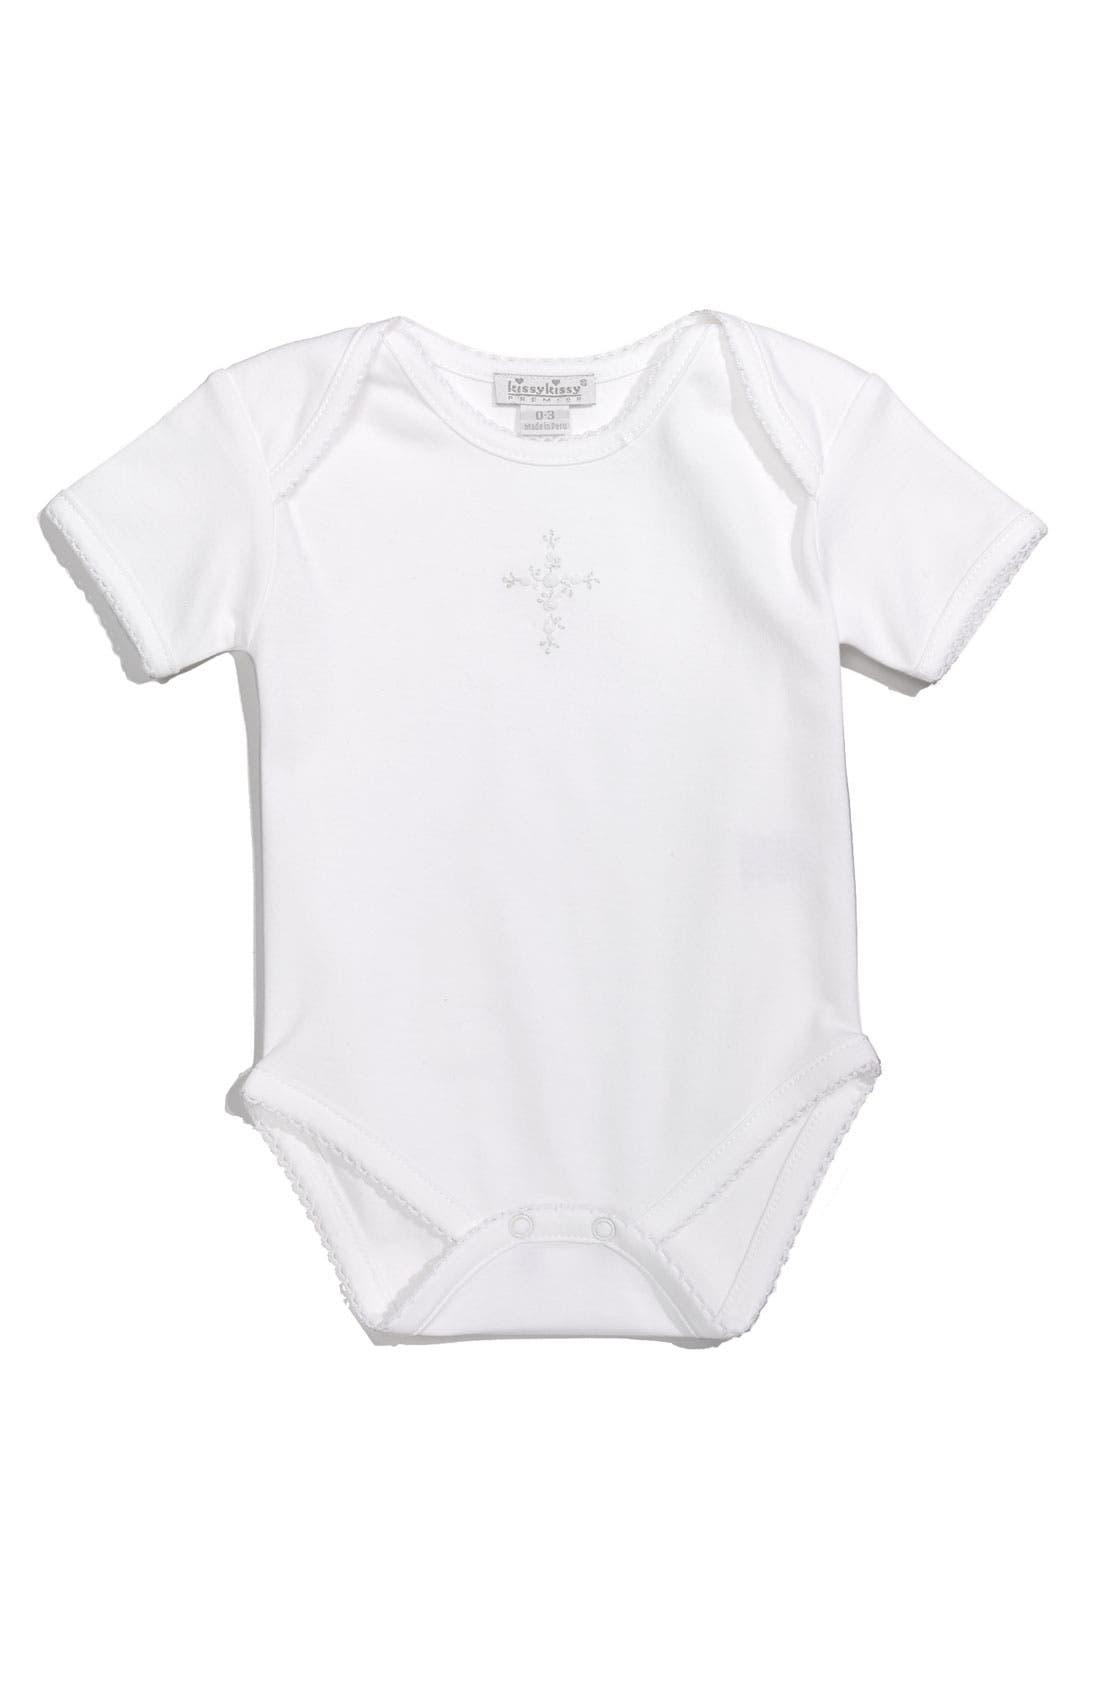 Alternate Image 1 Selected - Kissy Kissy Embroidered Bodysuit (Infant)